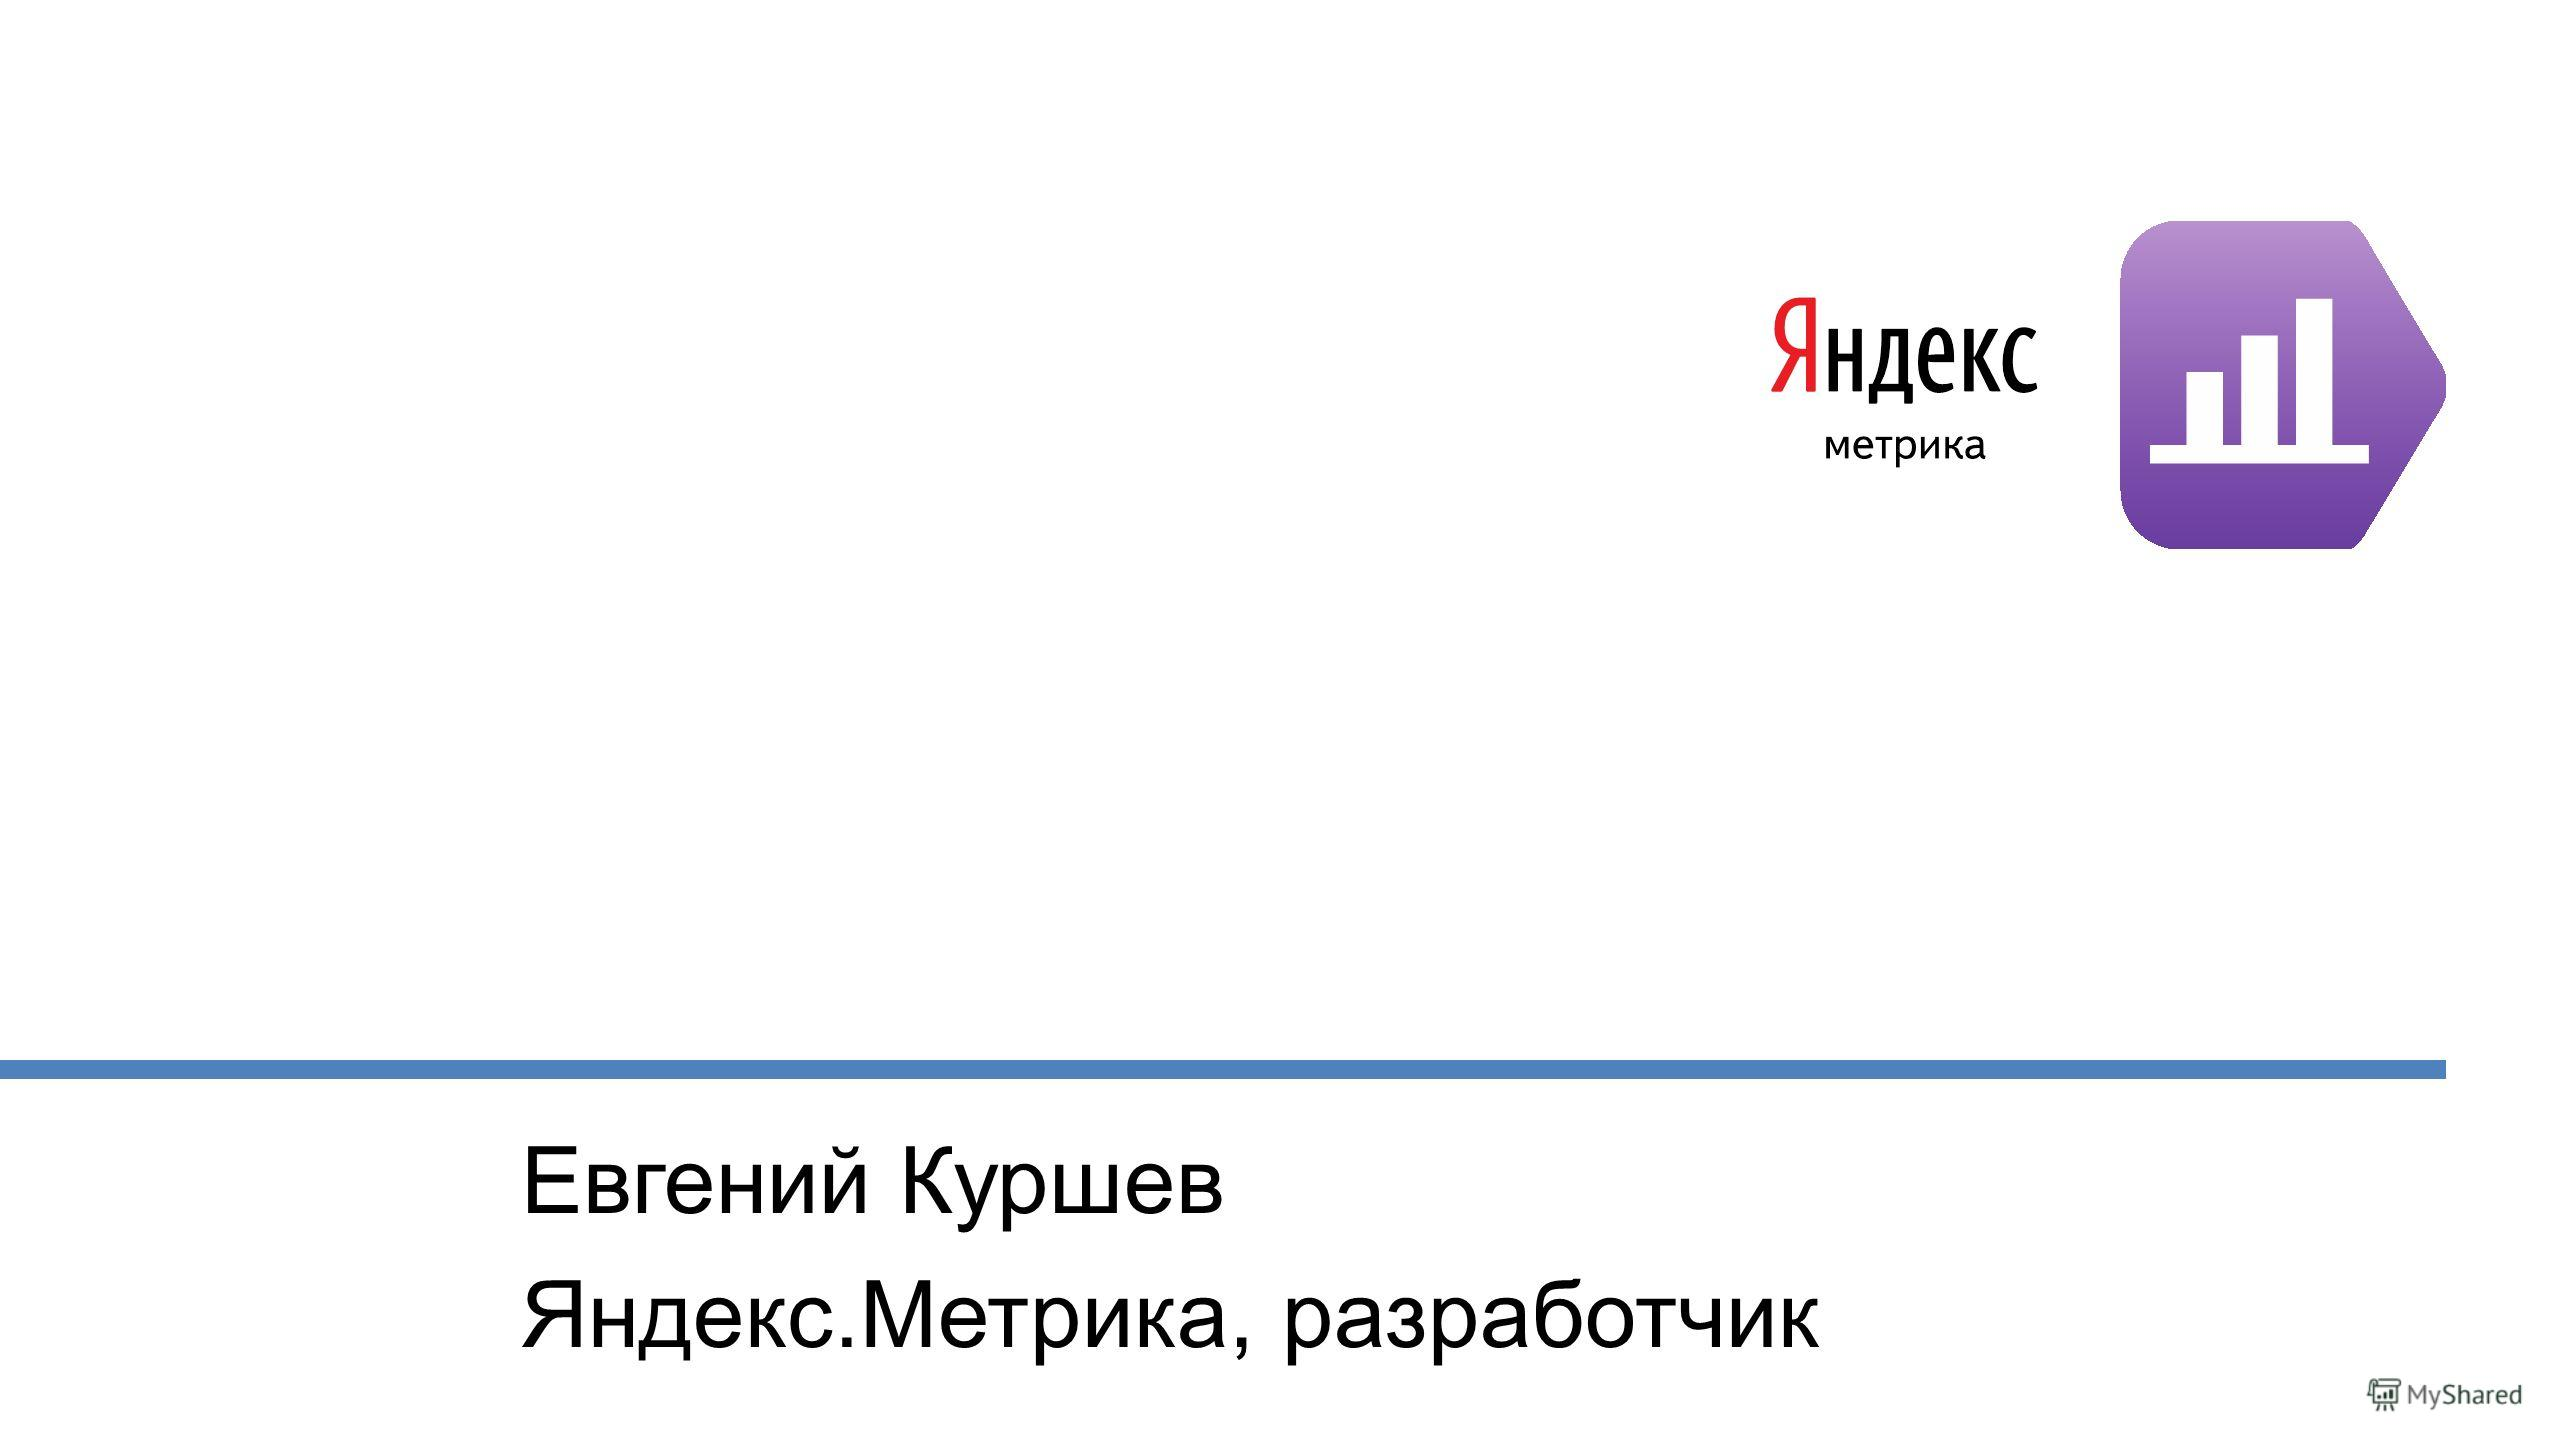 Евгений Куршев Яндекс.Метрика, разработчик